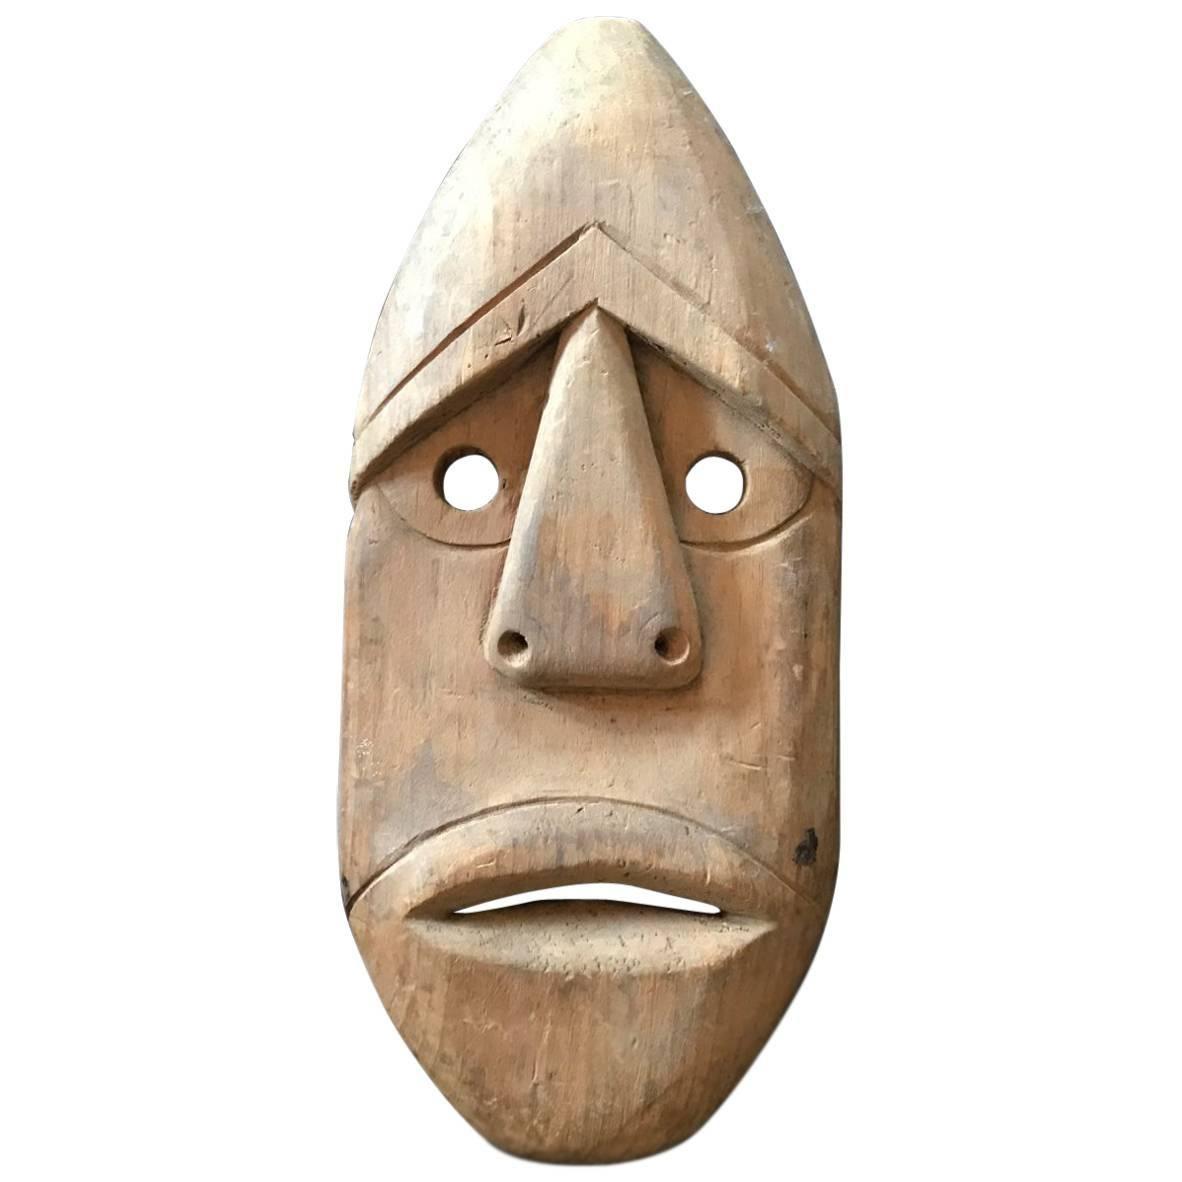 Hand Carved Wooden Native American Or Eskimo U0027Alutiiq/ Sugpiagu0027 Mask